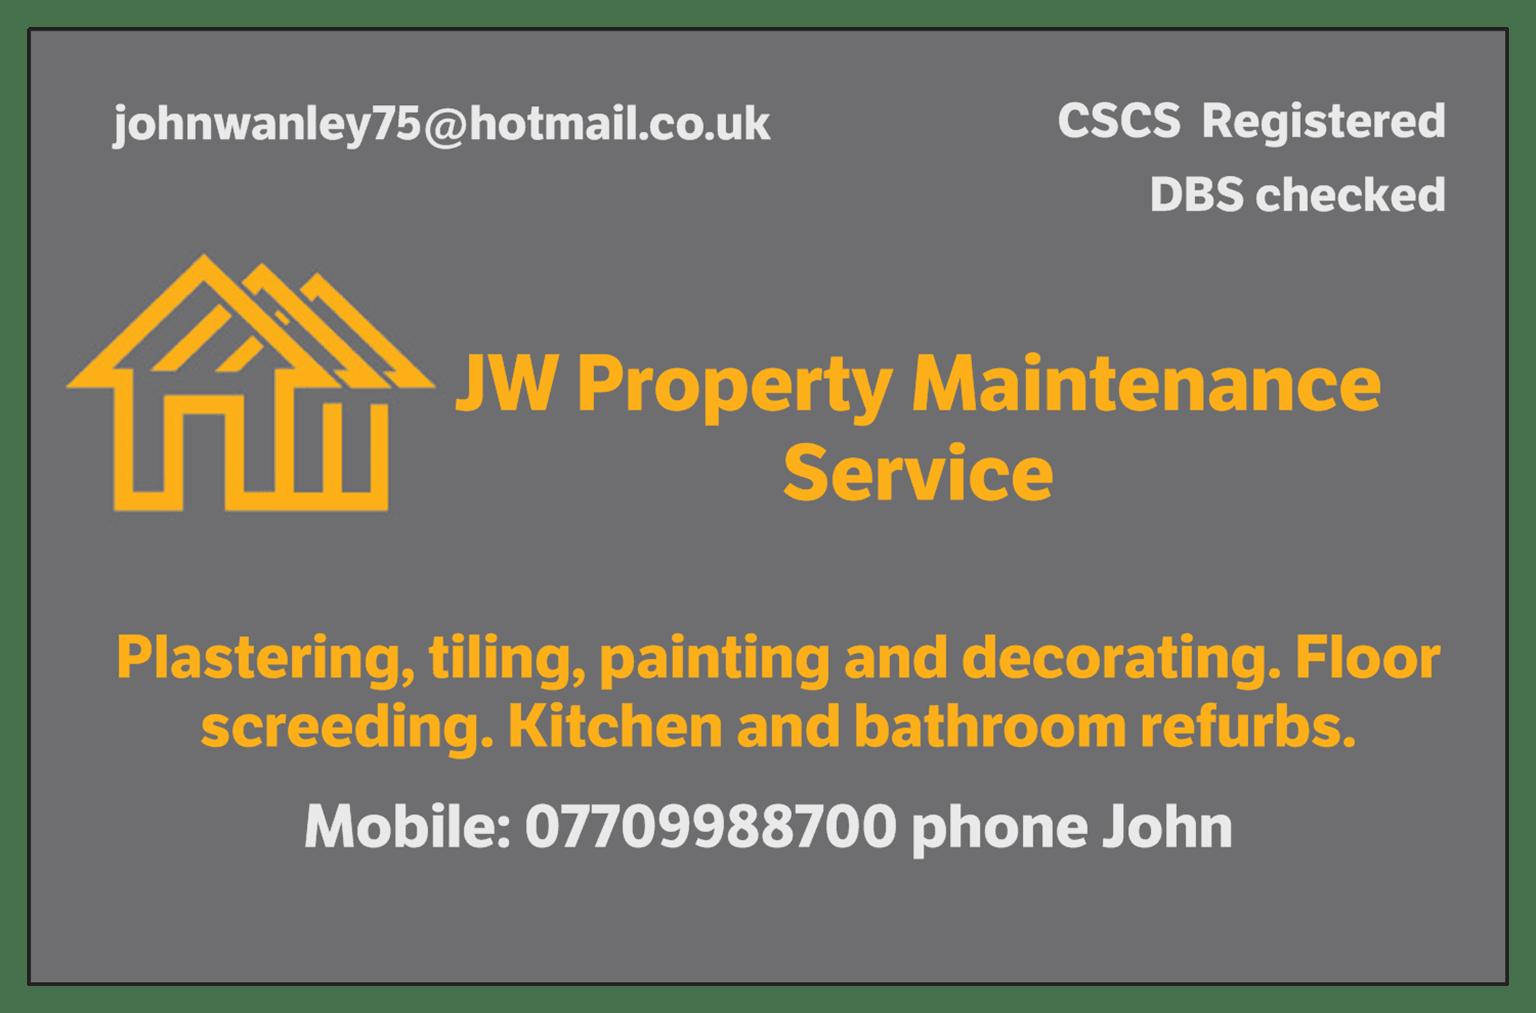 Jw Property Maintenance Service